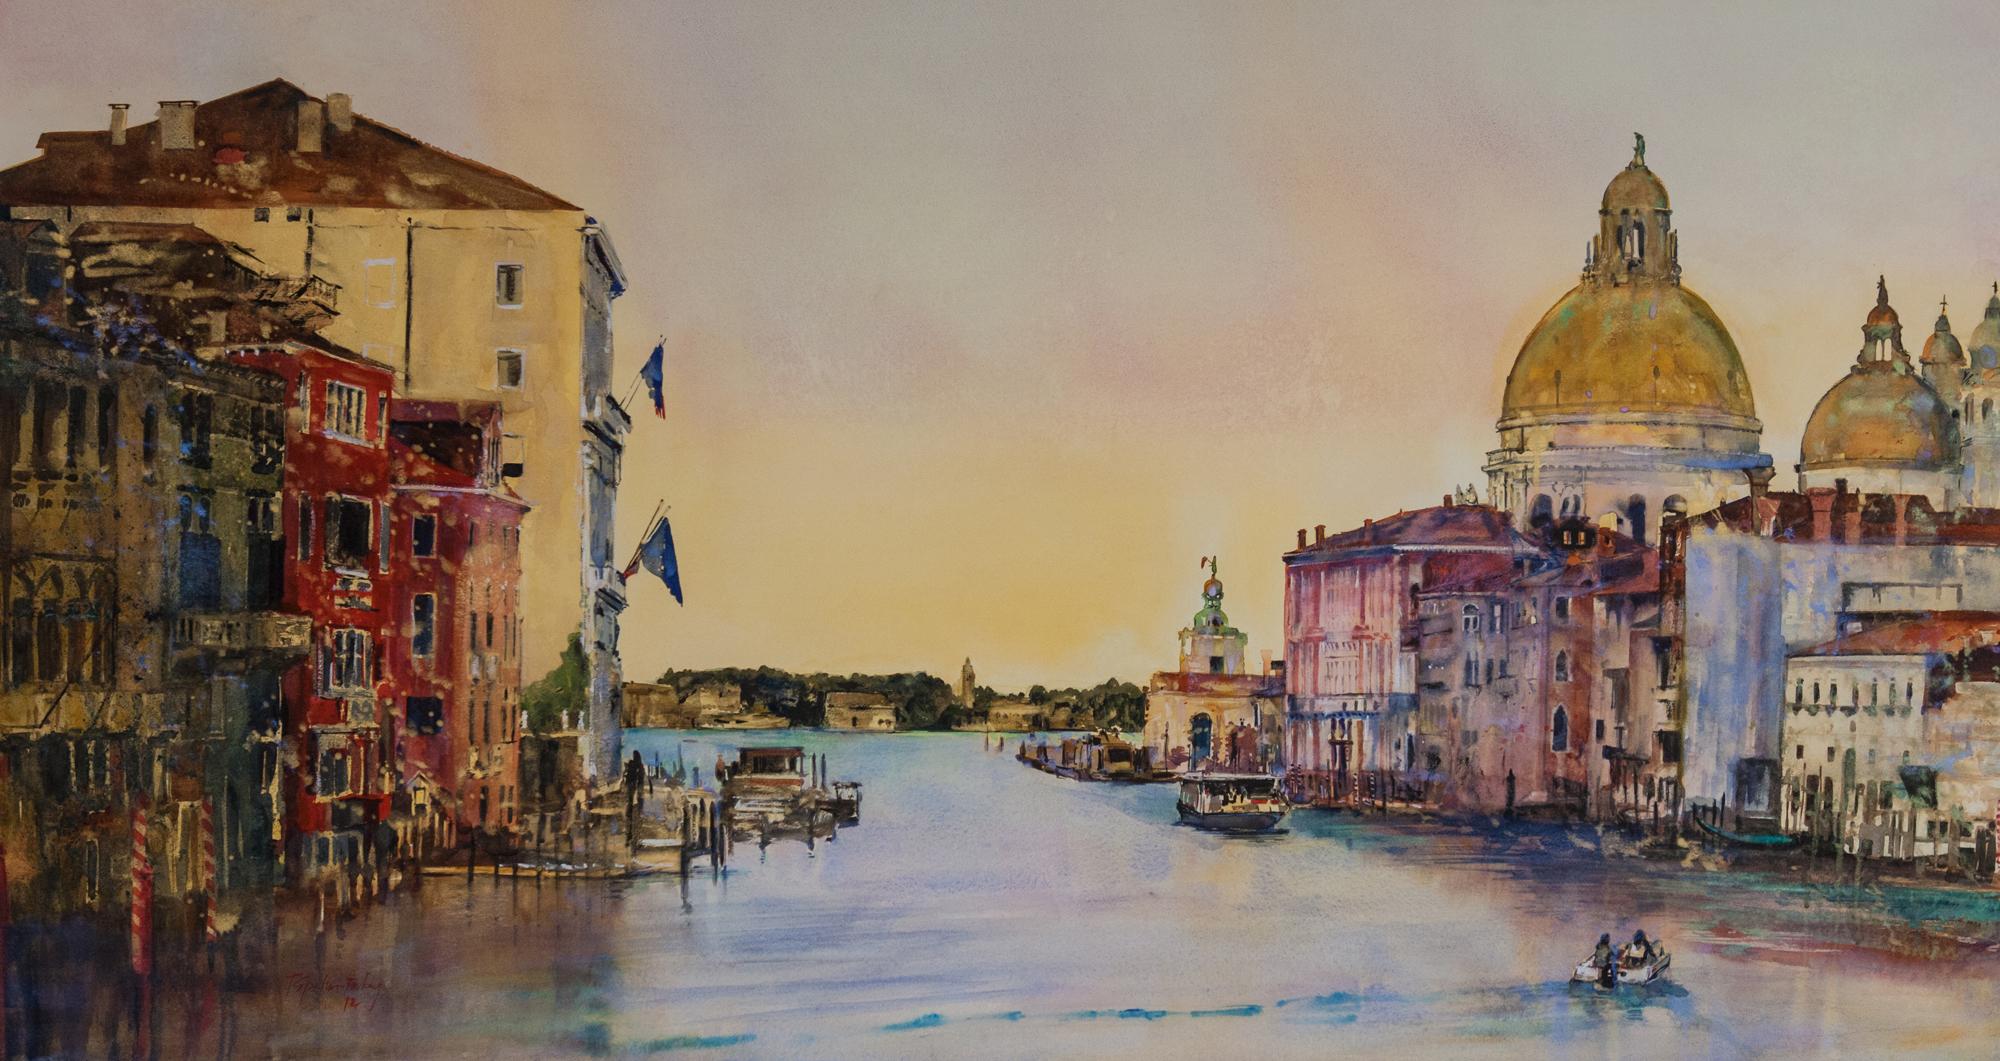 So Cal Clothing >> Imagining Venice: Watercolors of Terry Spehar-Fahey | Kwan ...